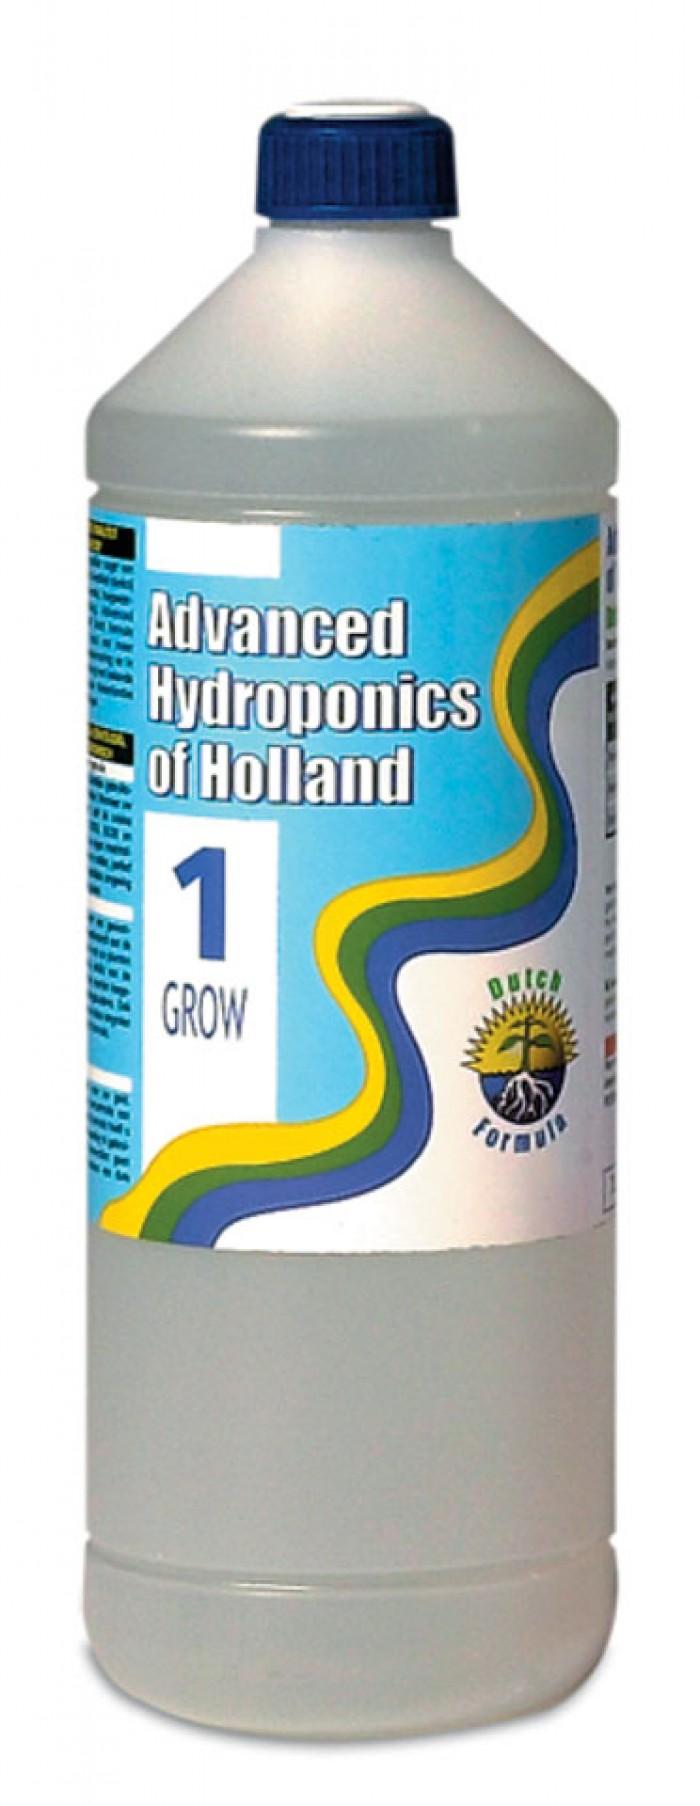 Dutch Fórmula Grow 1 (Advanced Hydroponics)